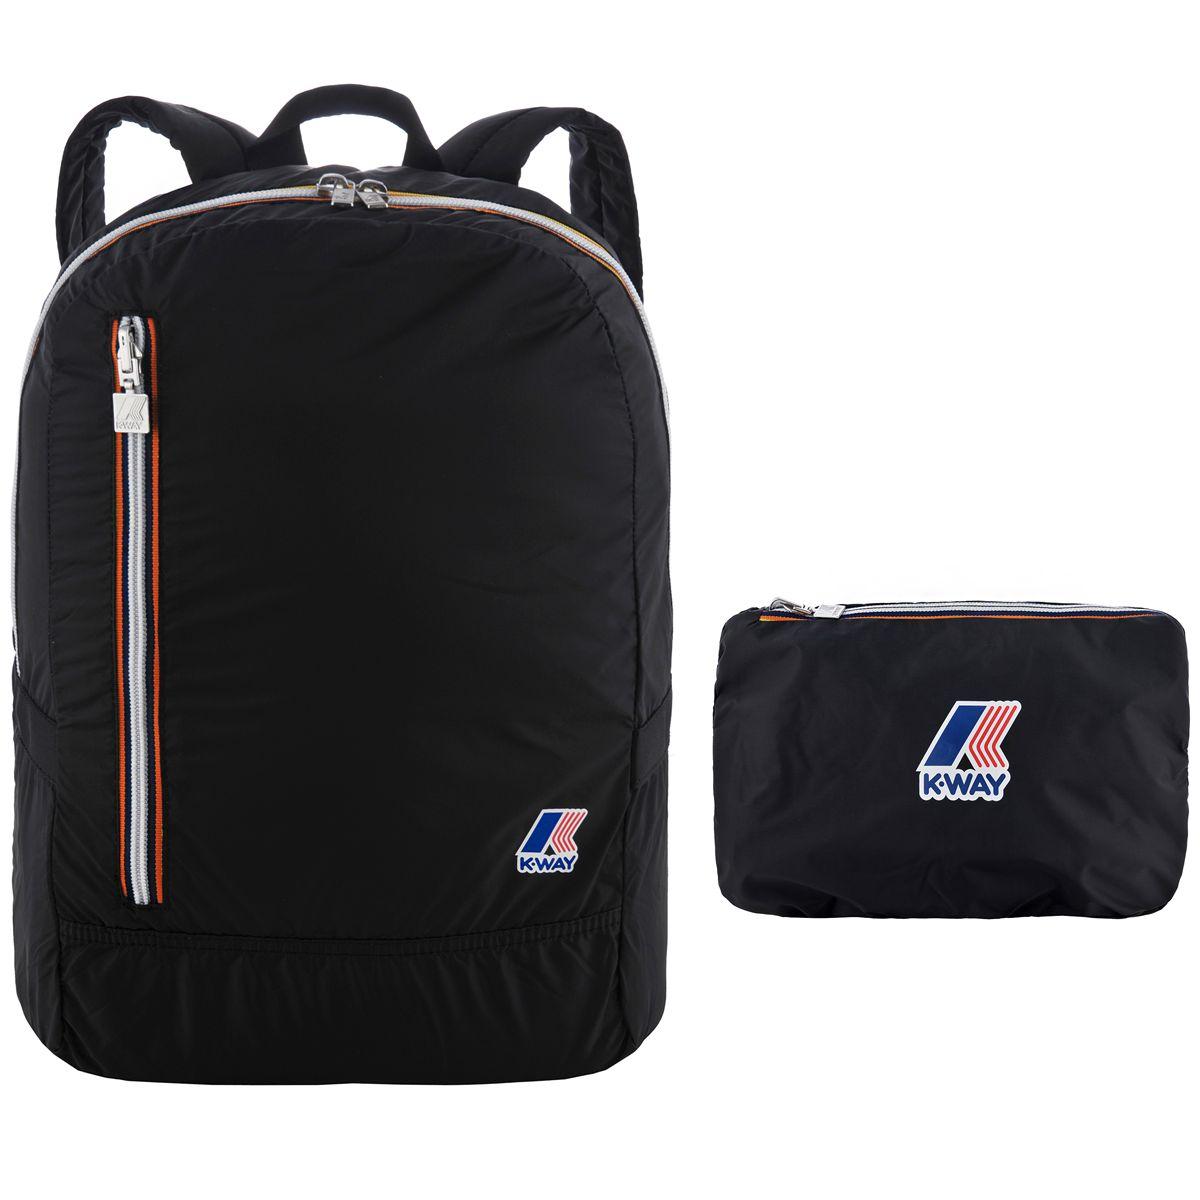 K way k pocket backpack zaino richiudibile latini sport for Interno k way